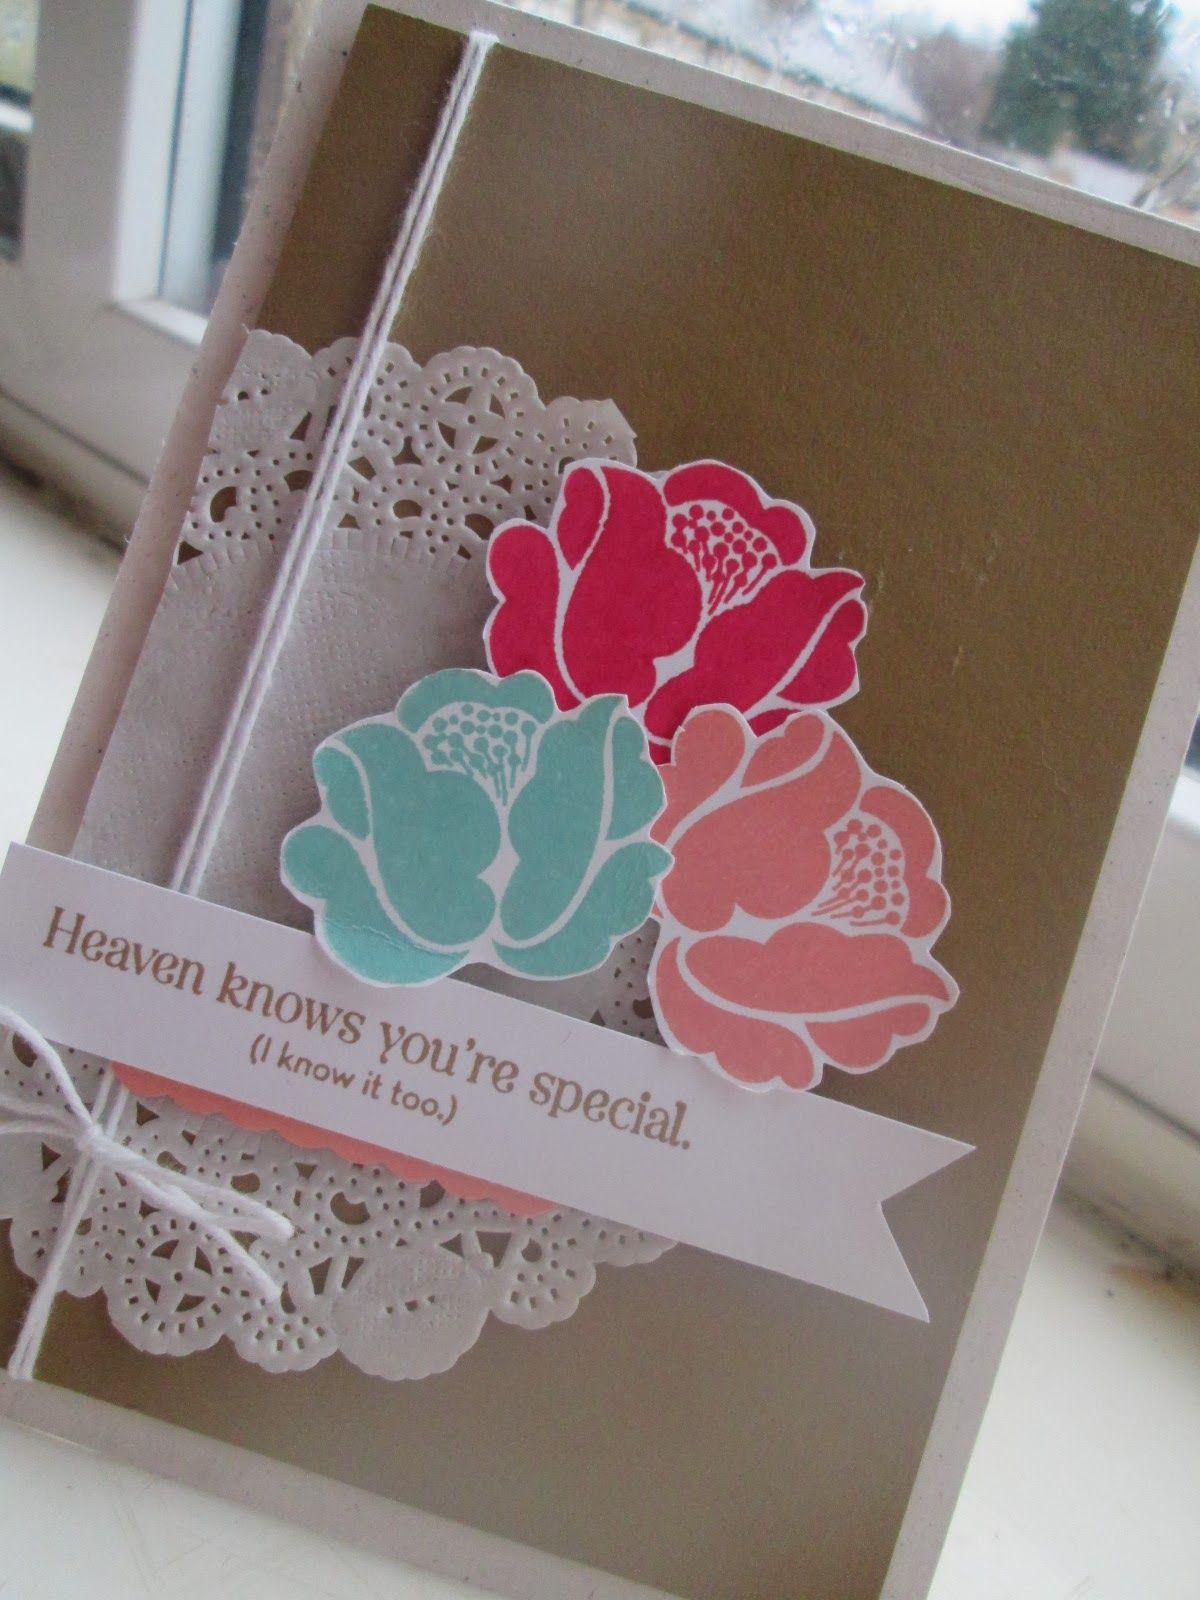 Jollicrafts Beautiful Handmade Cards Cards Handmade Paper Crafts